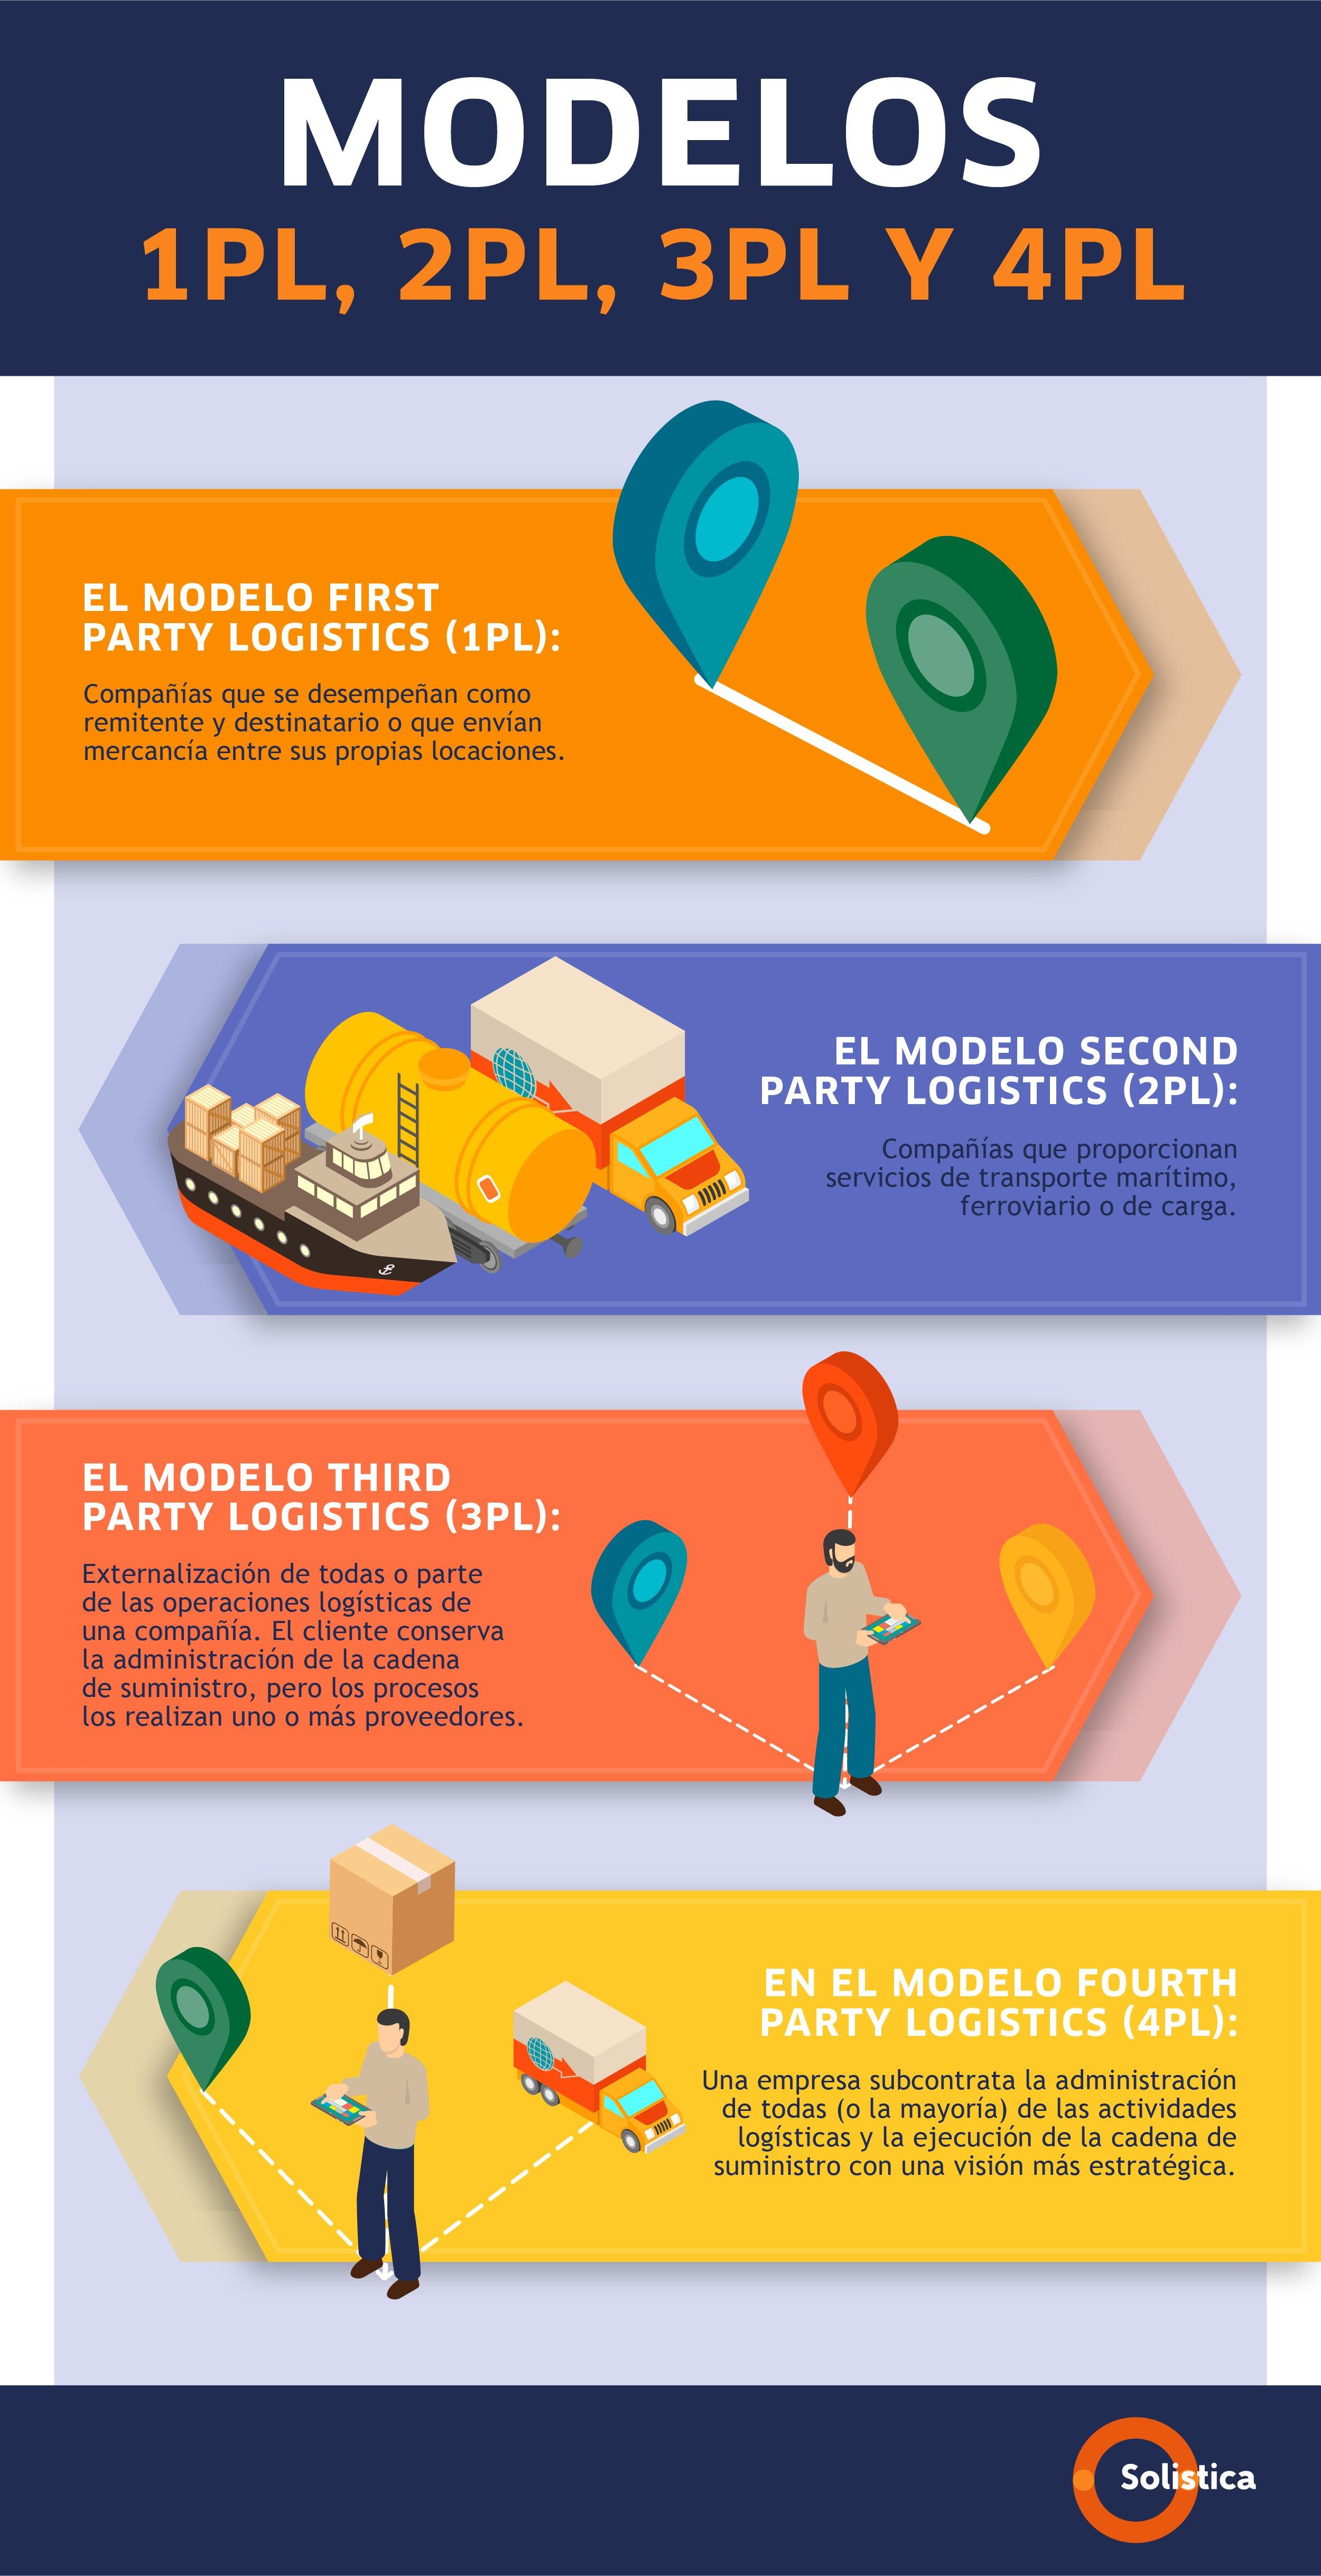 _SOL-Infografía Blog No. 6 ABR La era 4PL